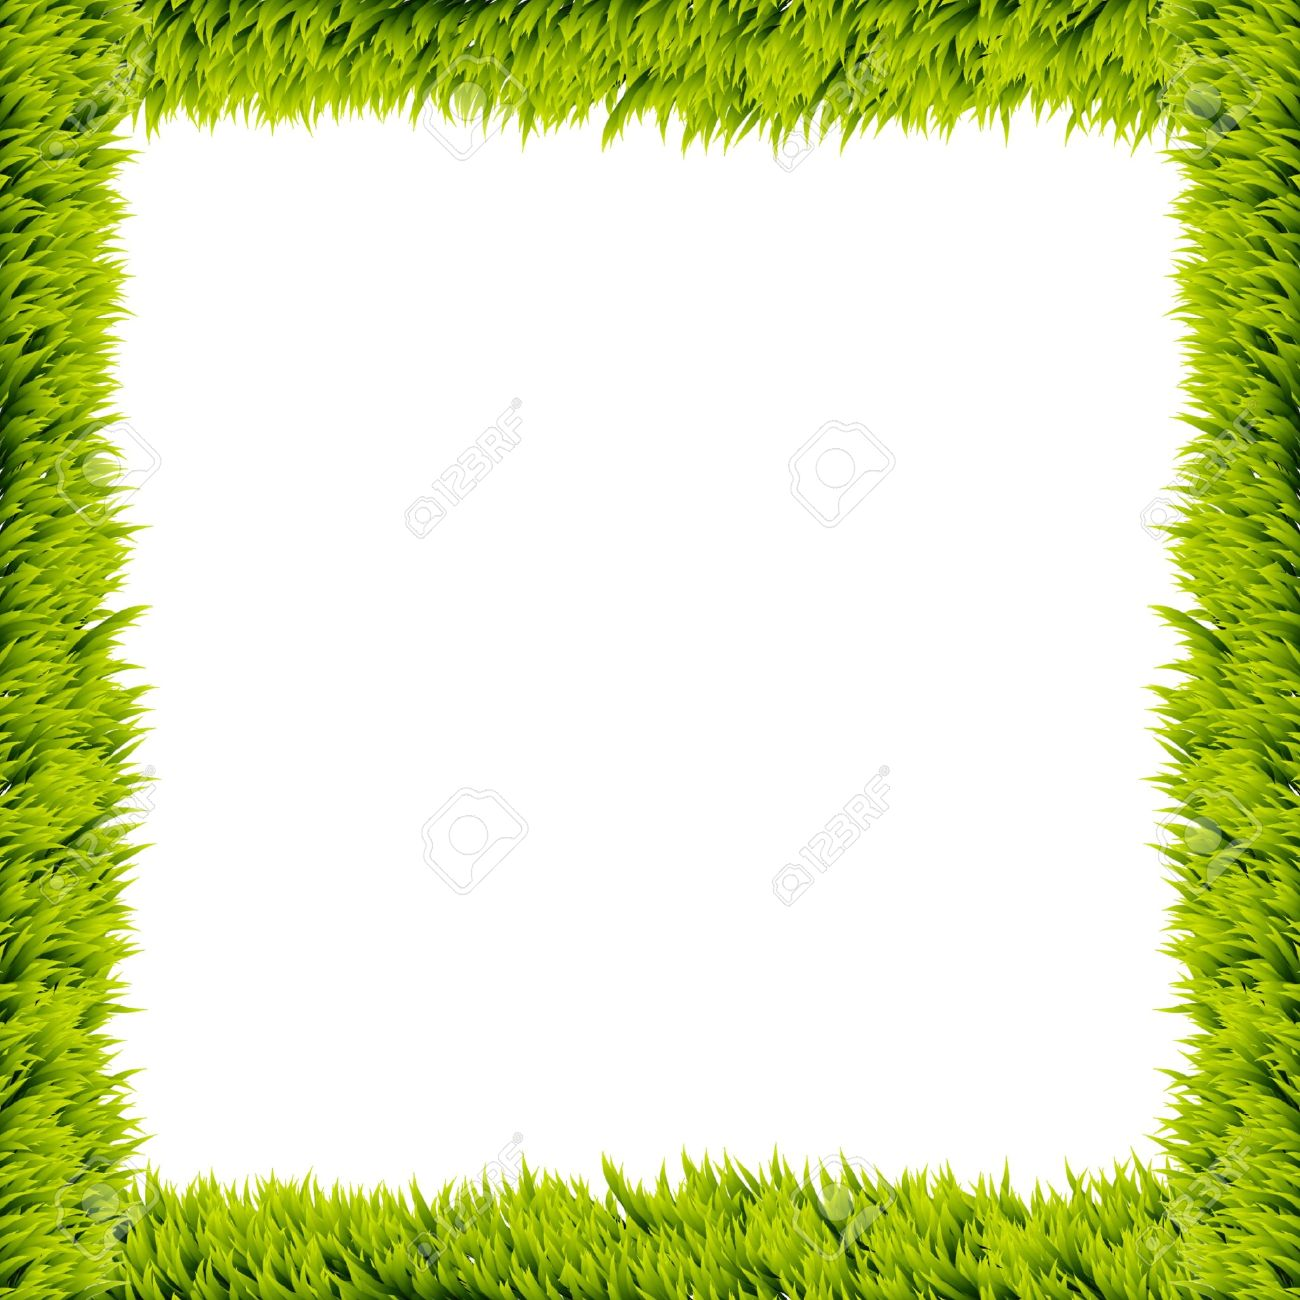 Fresh green grass frame on white background Stock Photo - 15281753